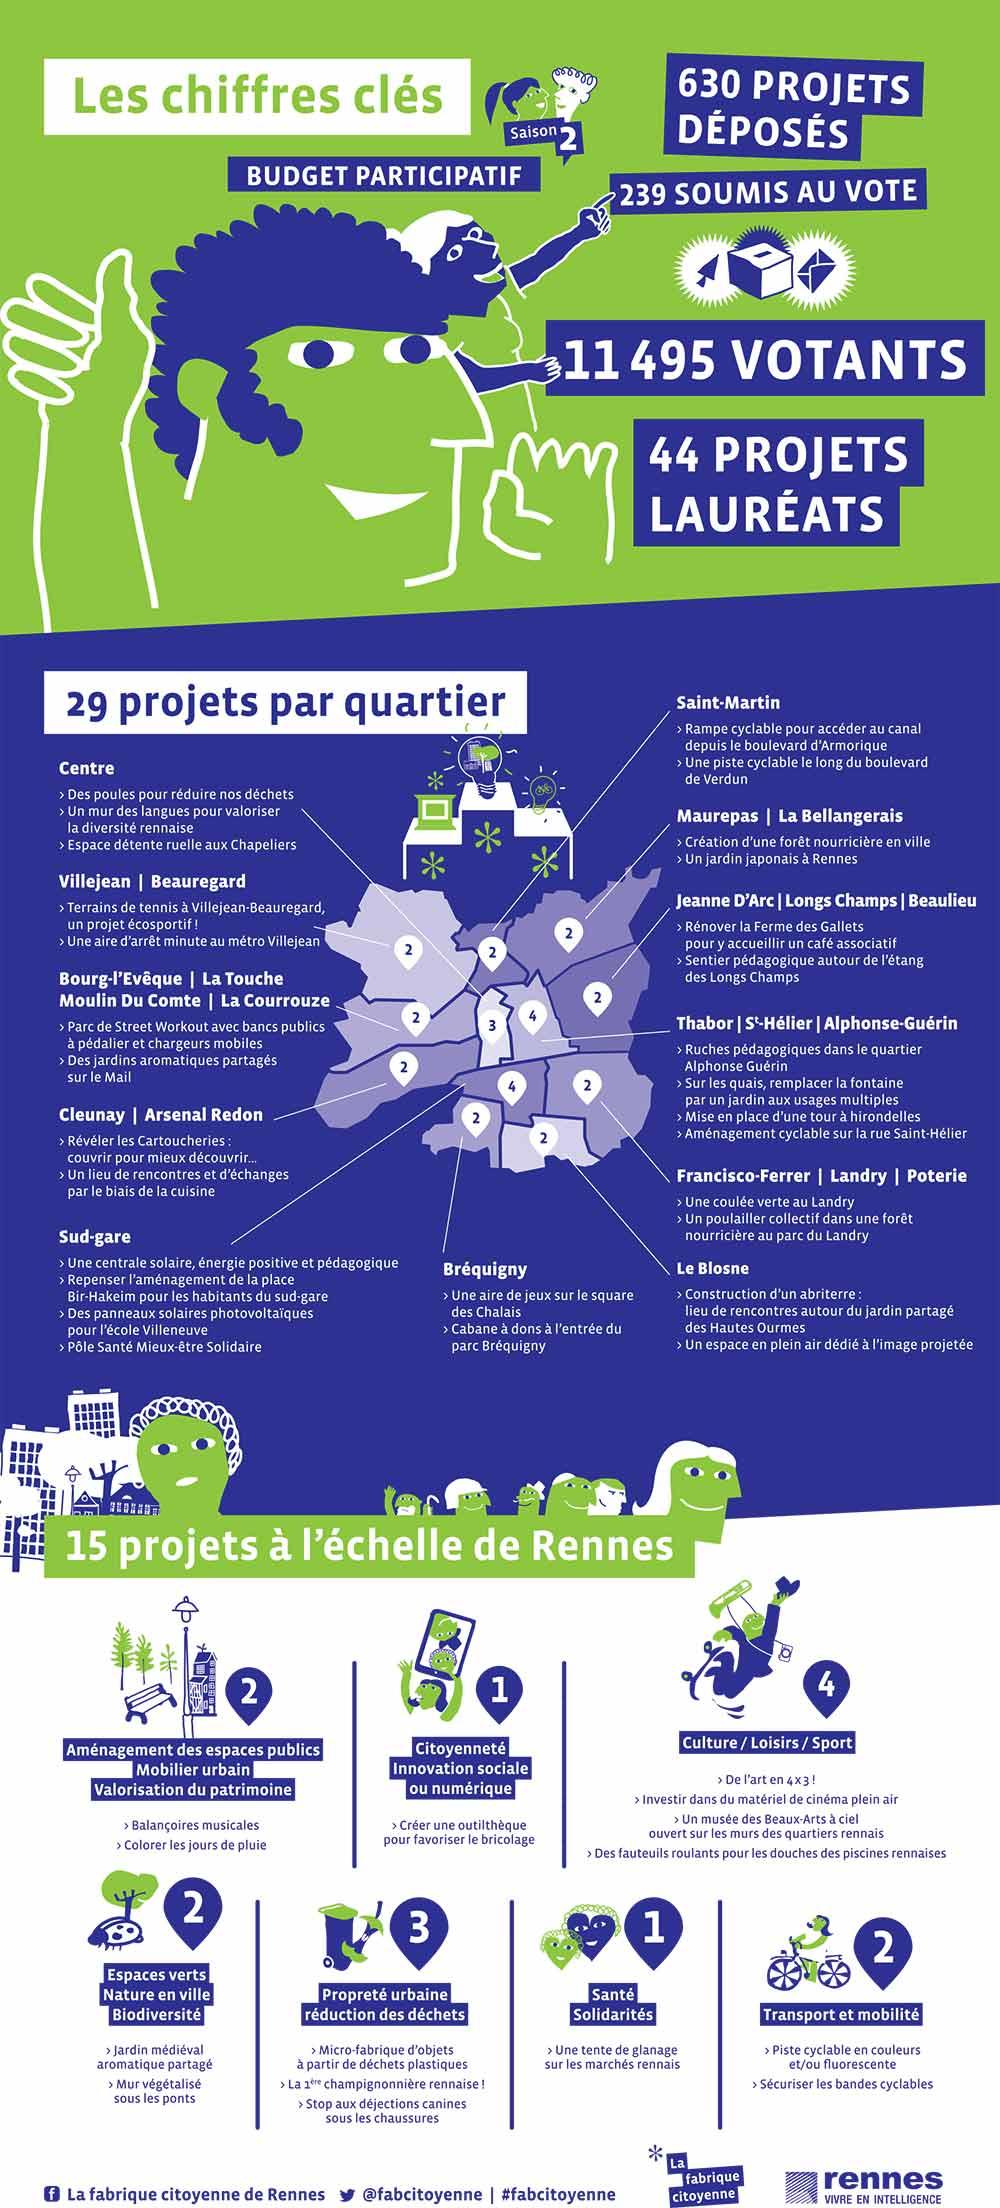 projets-gagnants-budget-participatif